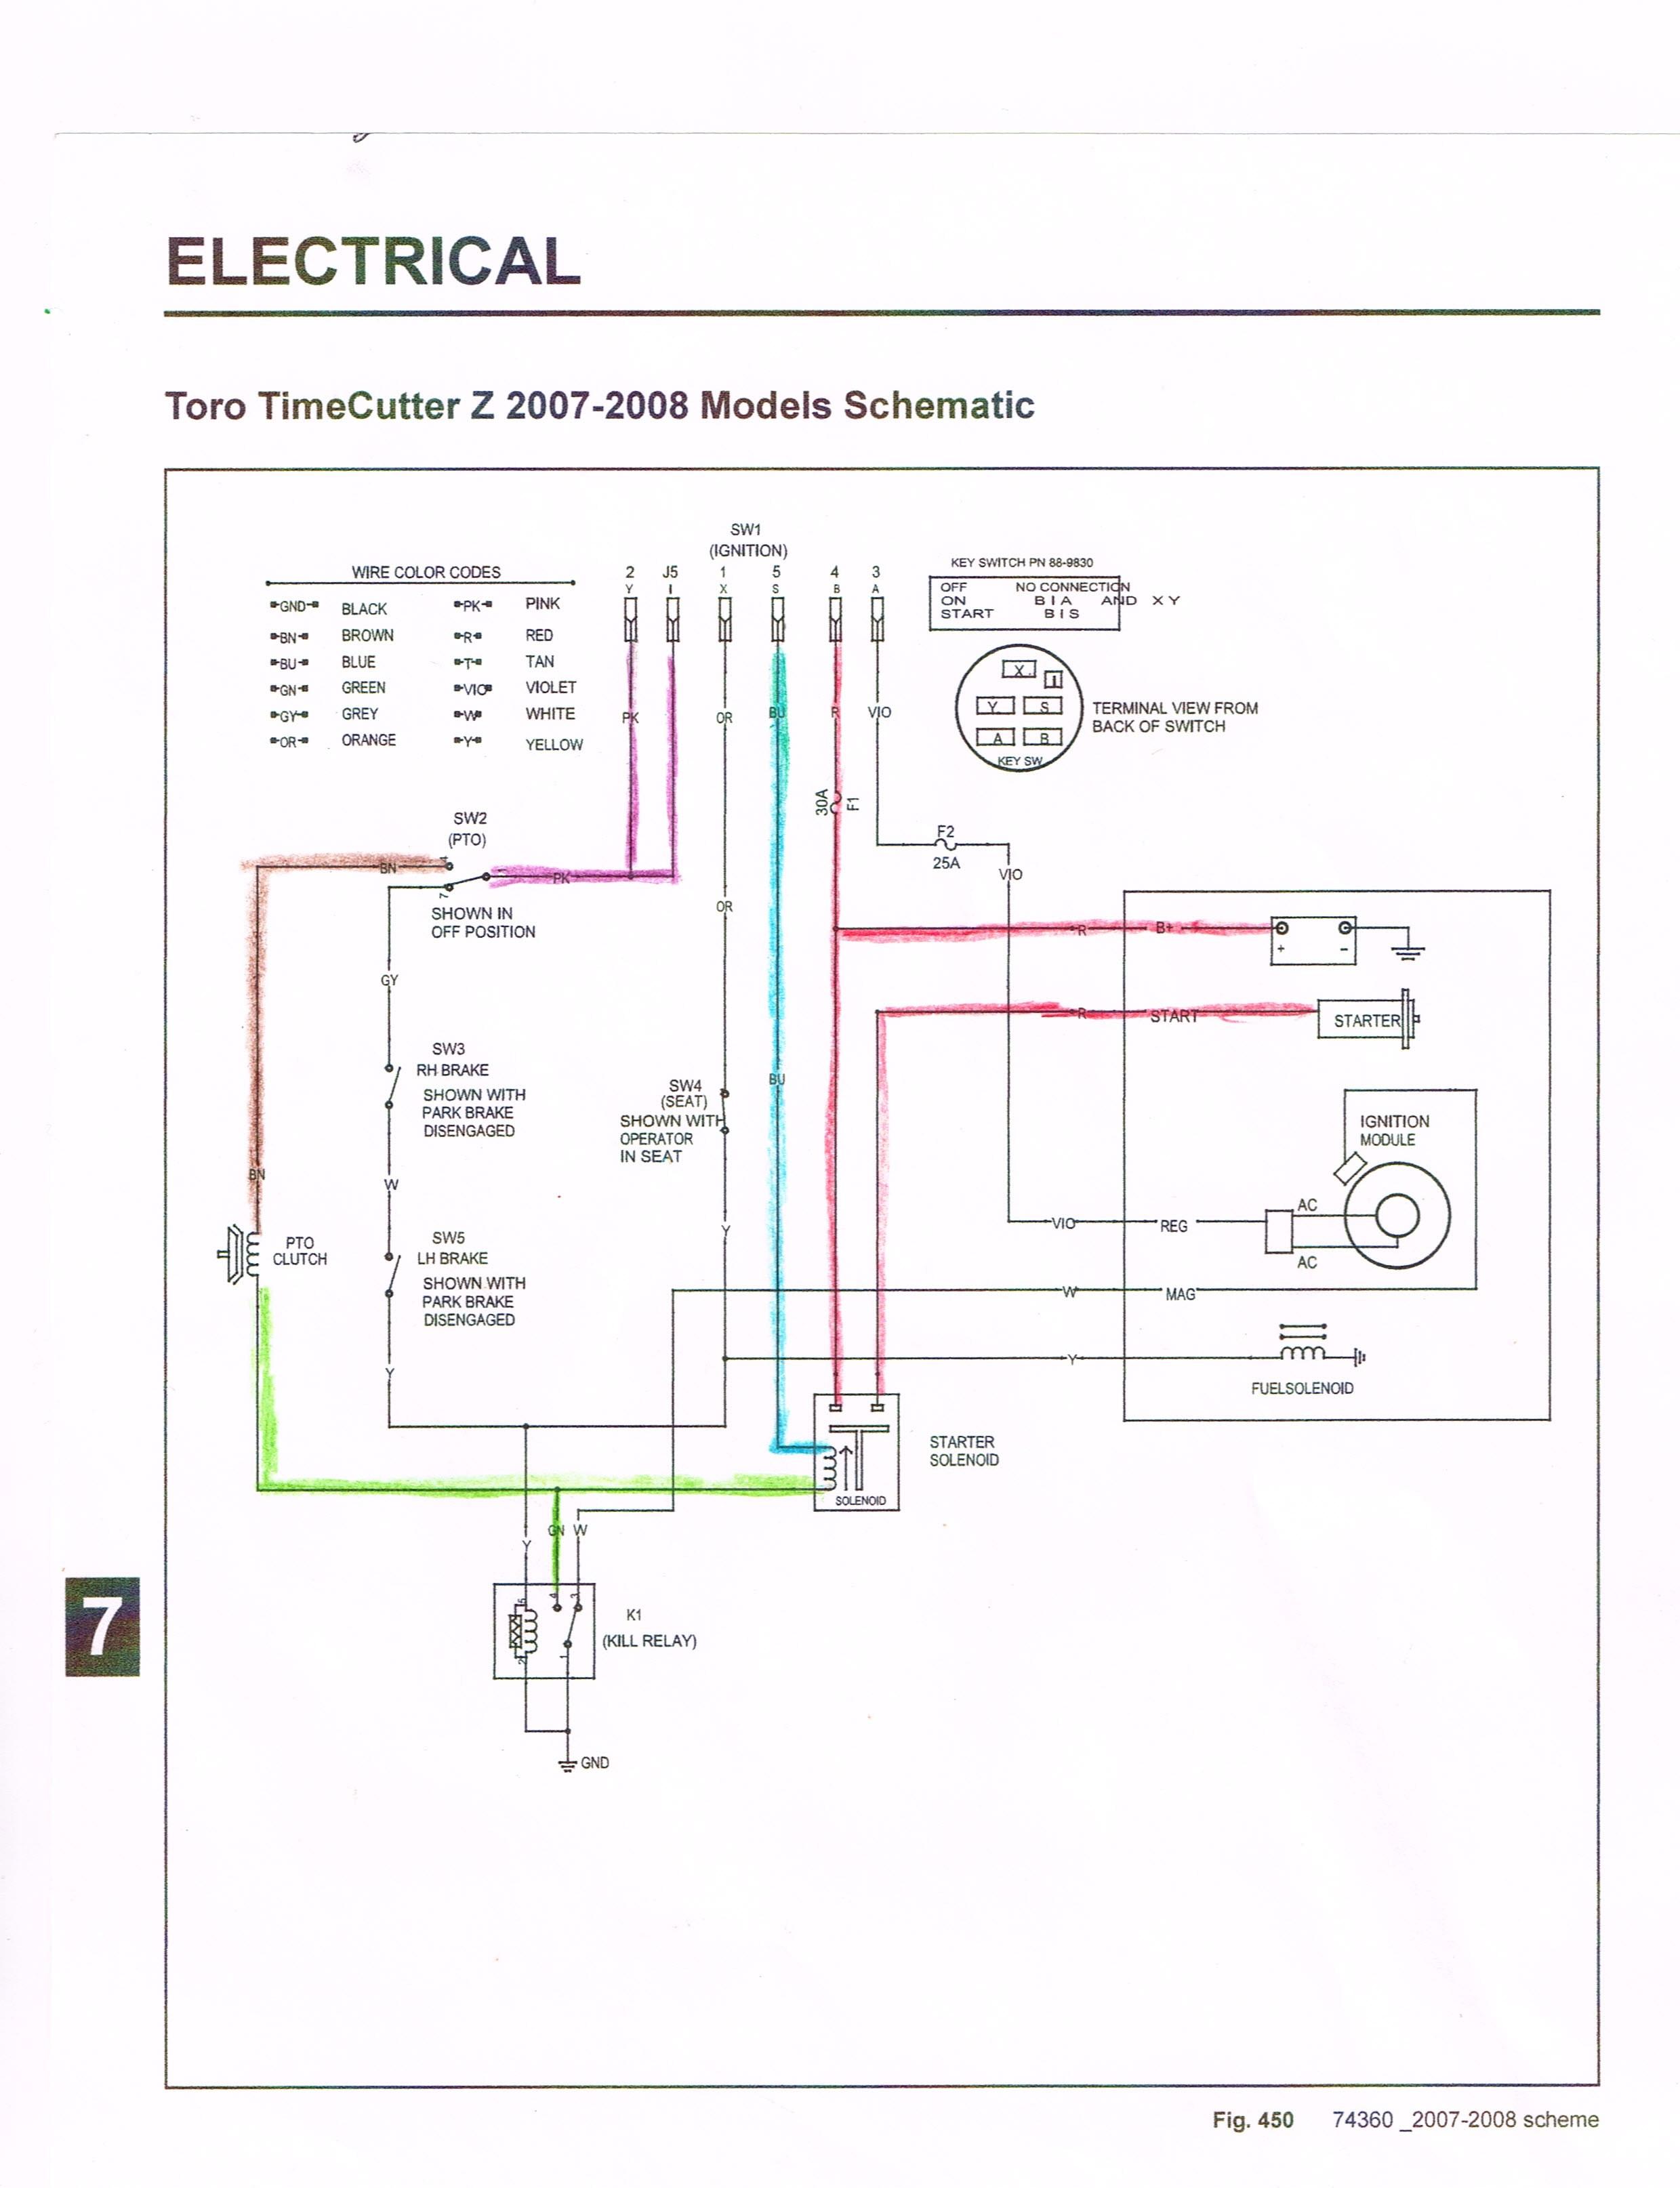 zl_7237] toro workman wiring diagram schematic wiring toro 400xt wiring diagram suzuki samurai wiring diagram inoma groa mohammedshrine librar wiring 101